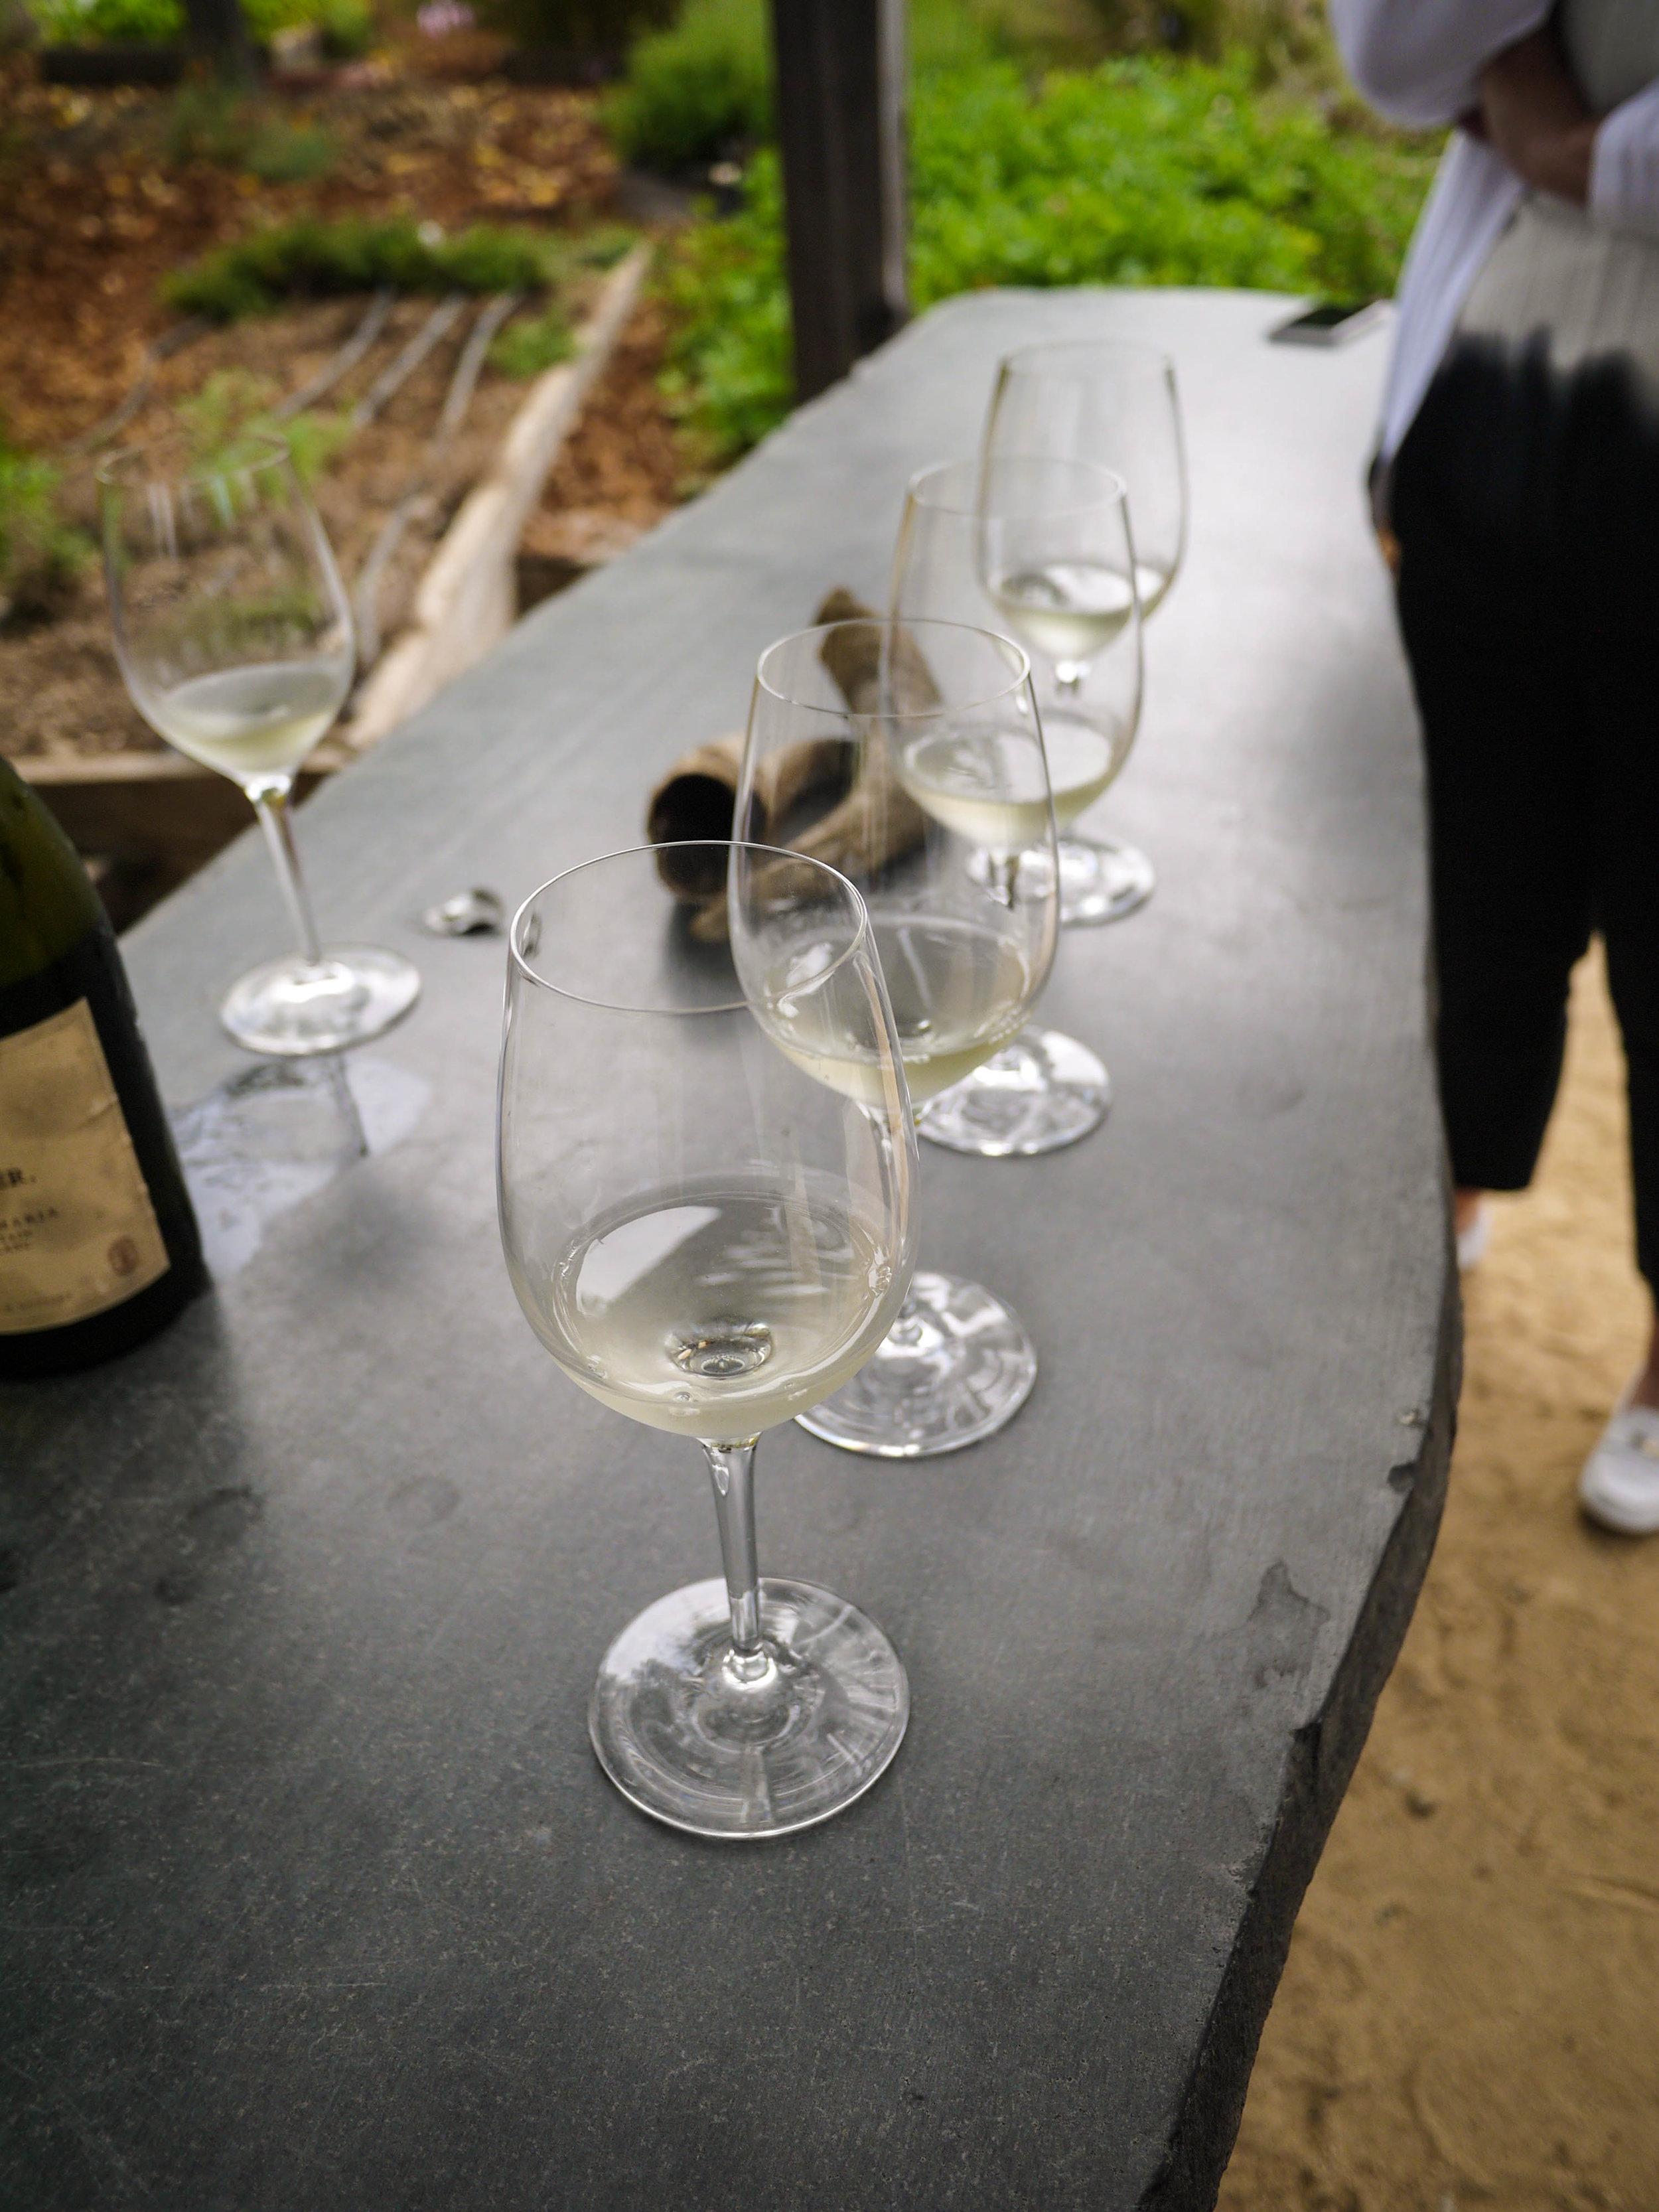 This winery focused on biodynamic wines